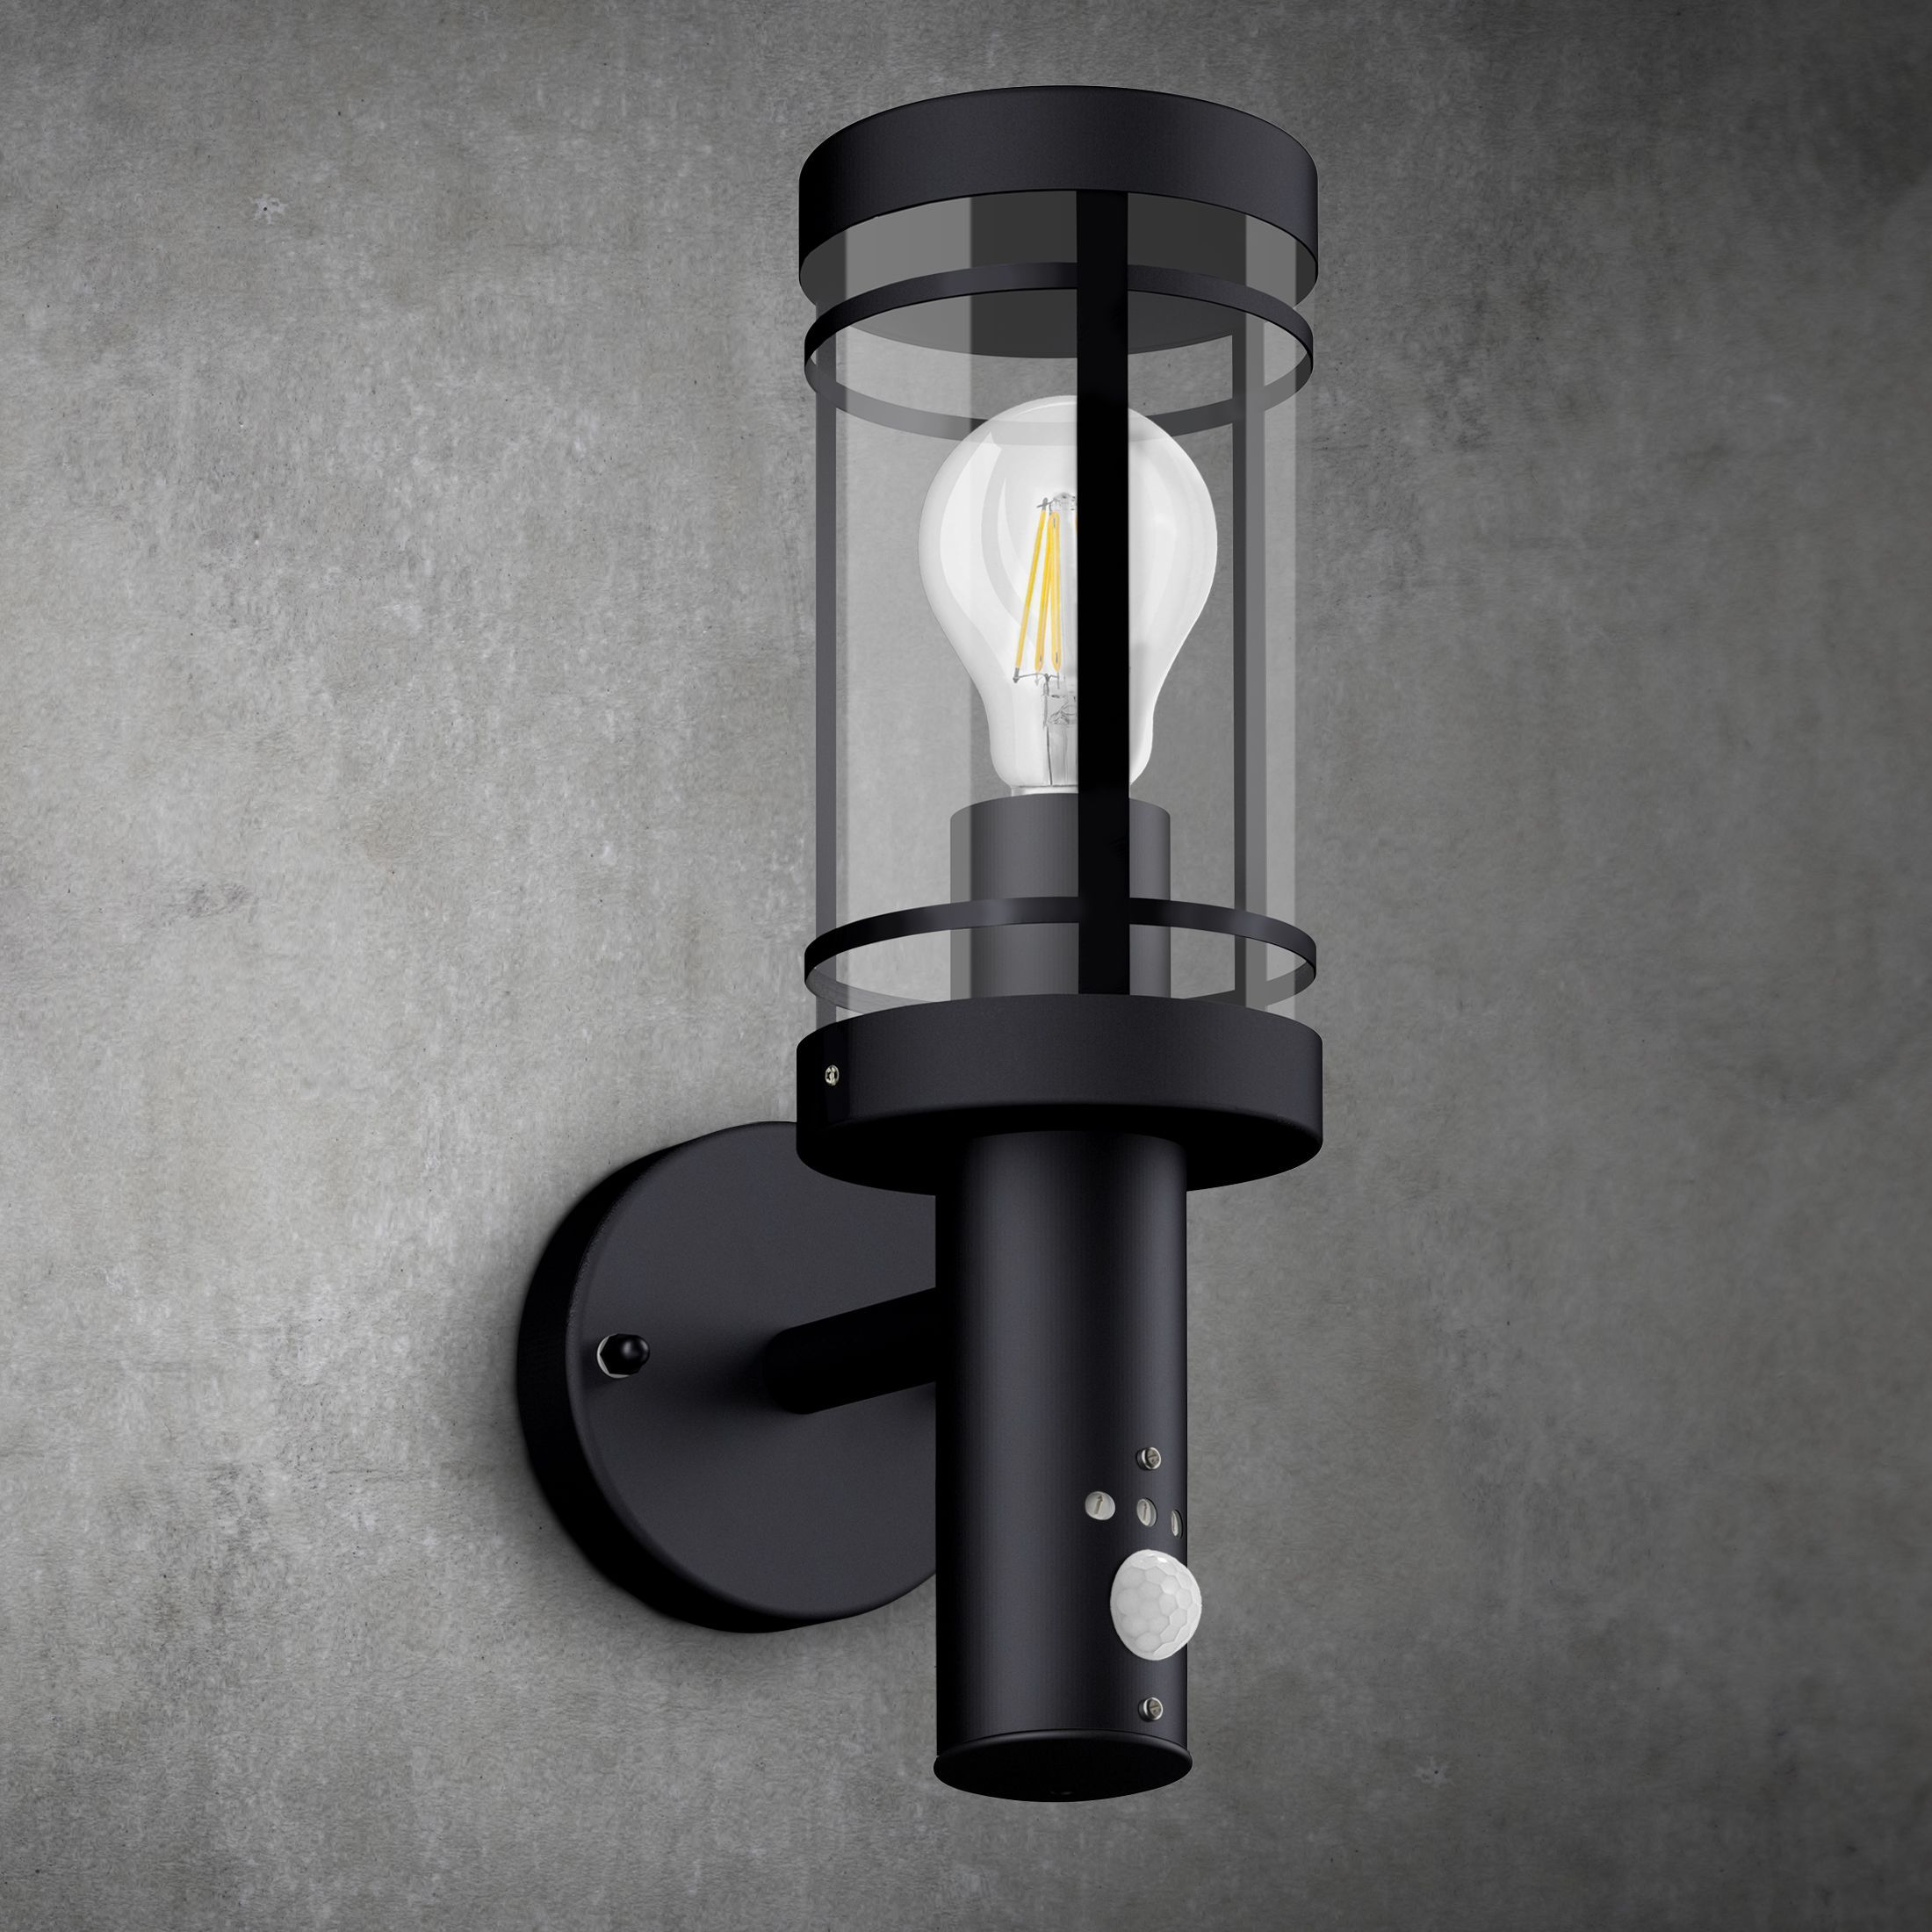 Aussen Wandlaterne Movi Mit Bewegungsmelder Ip44 Schwarz Inkl Osram Led E27 6w Warmweiss In 2020 Wall Lights Light Lighting